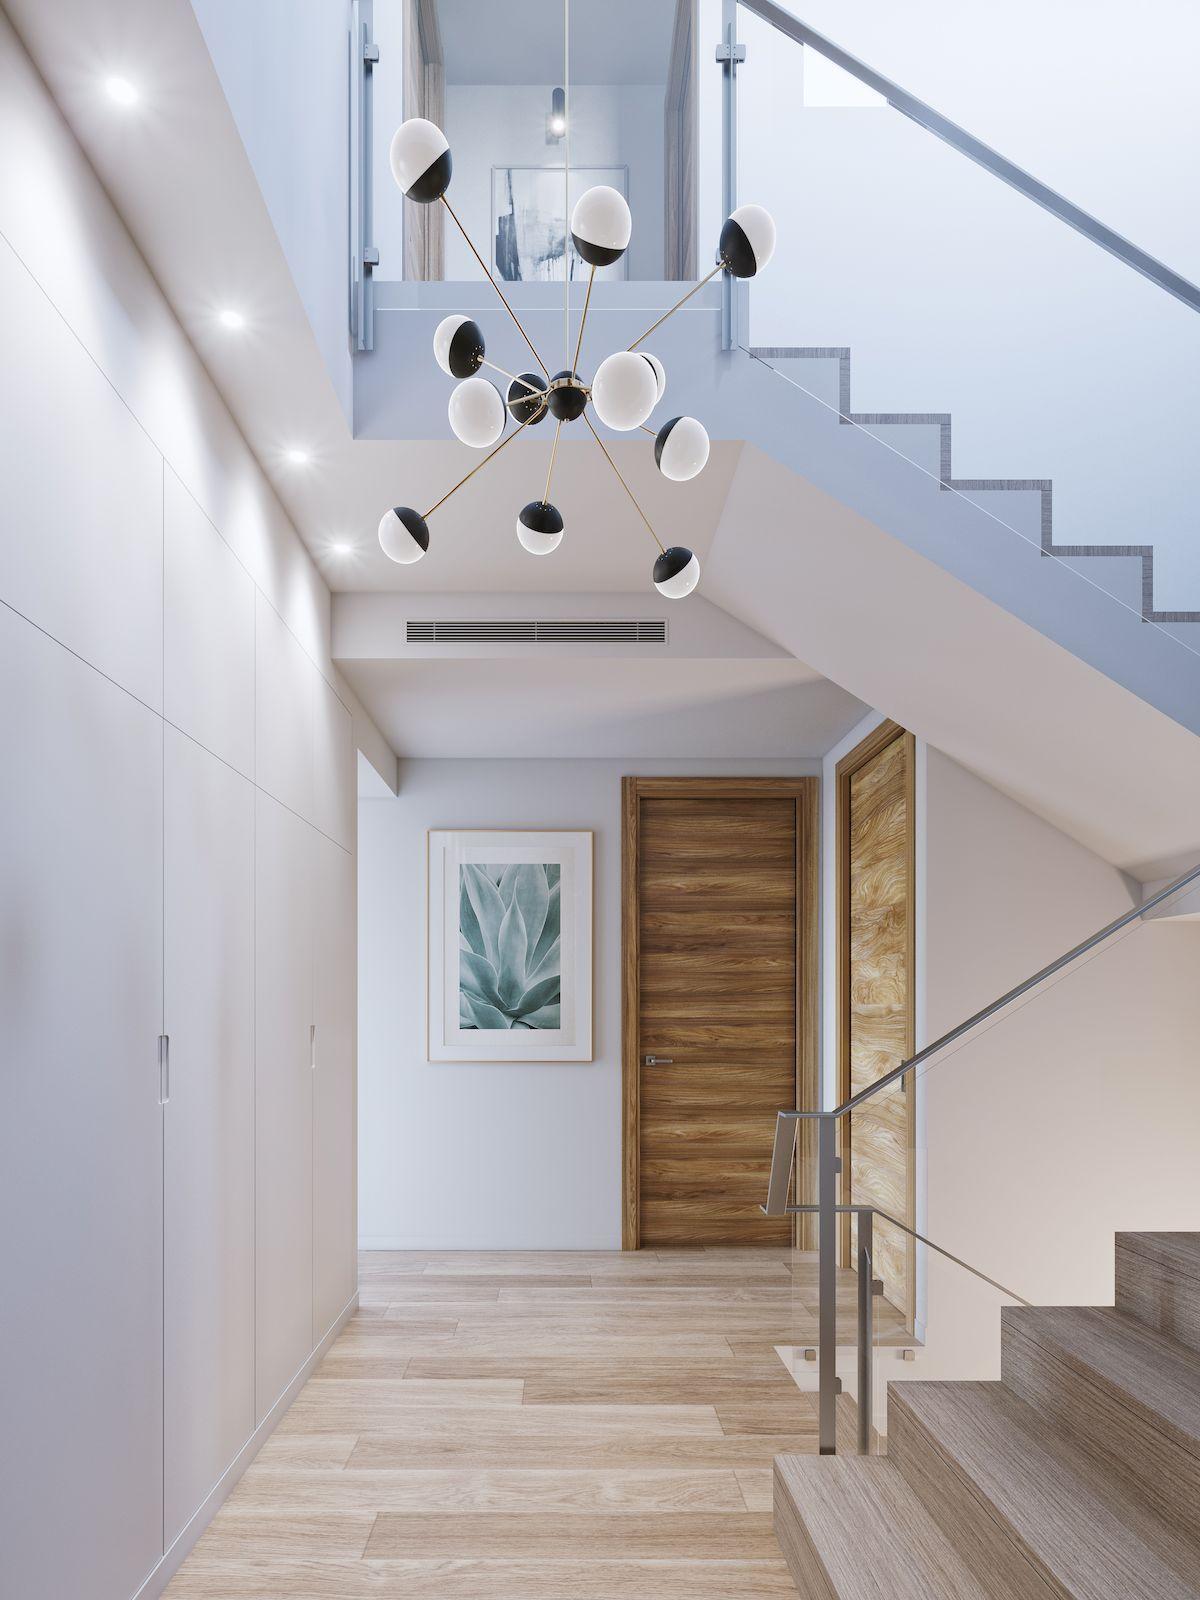 Villa de Lujo estilo Moderna a la Venta en Finestrat Hills - Benidorm